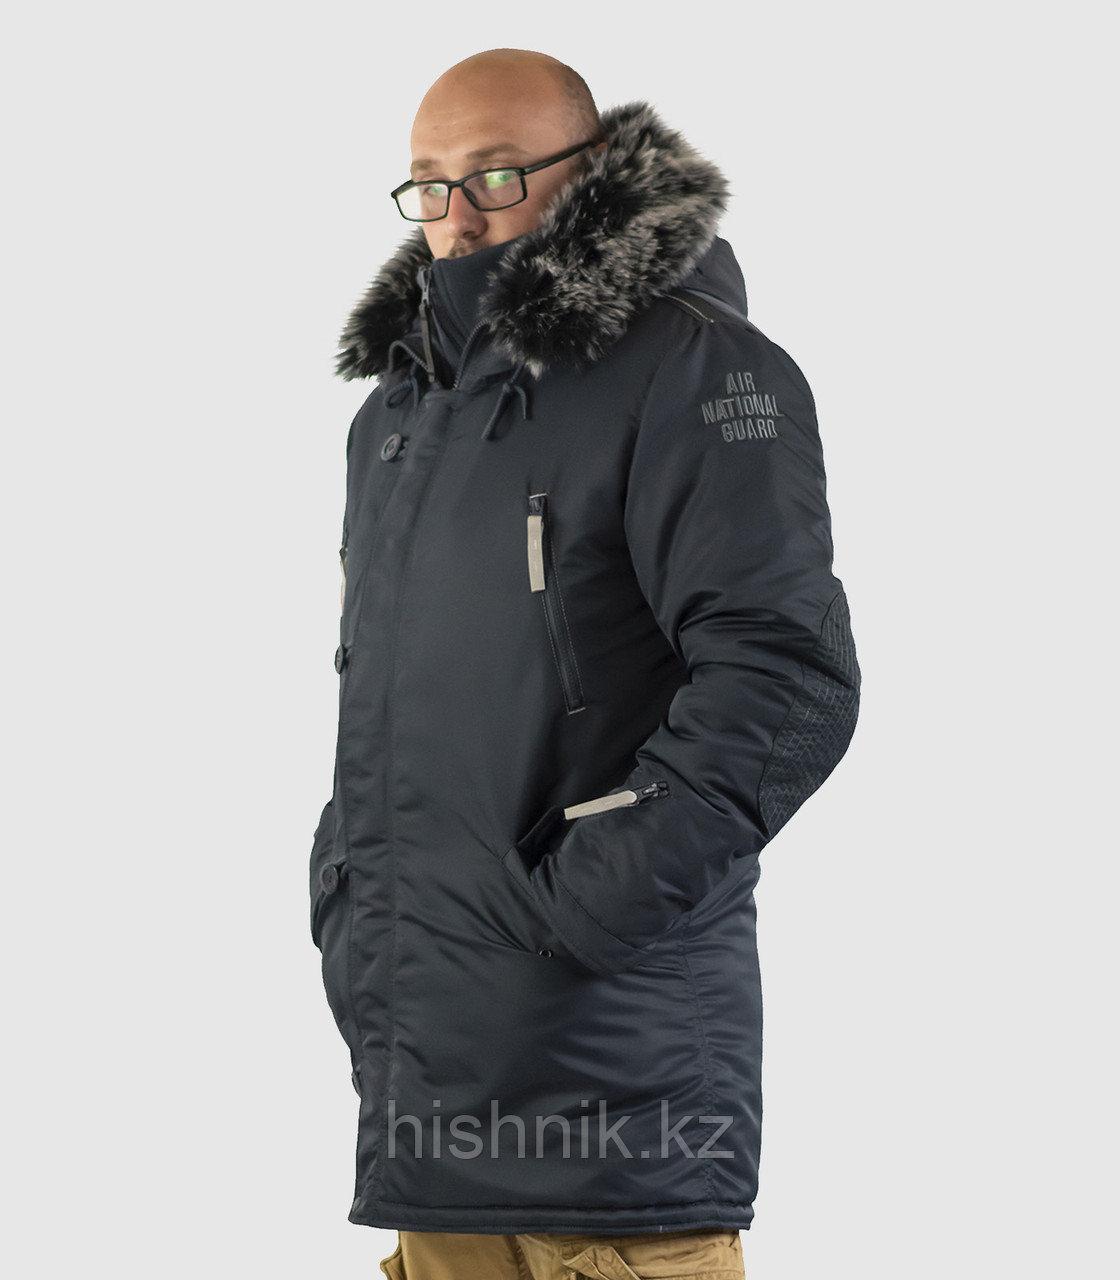 Куртка мужская ARKTIK STEEL BLUE/GUN METAL